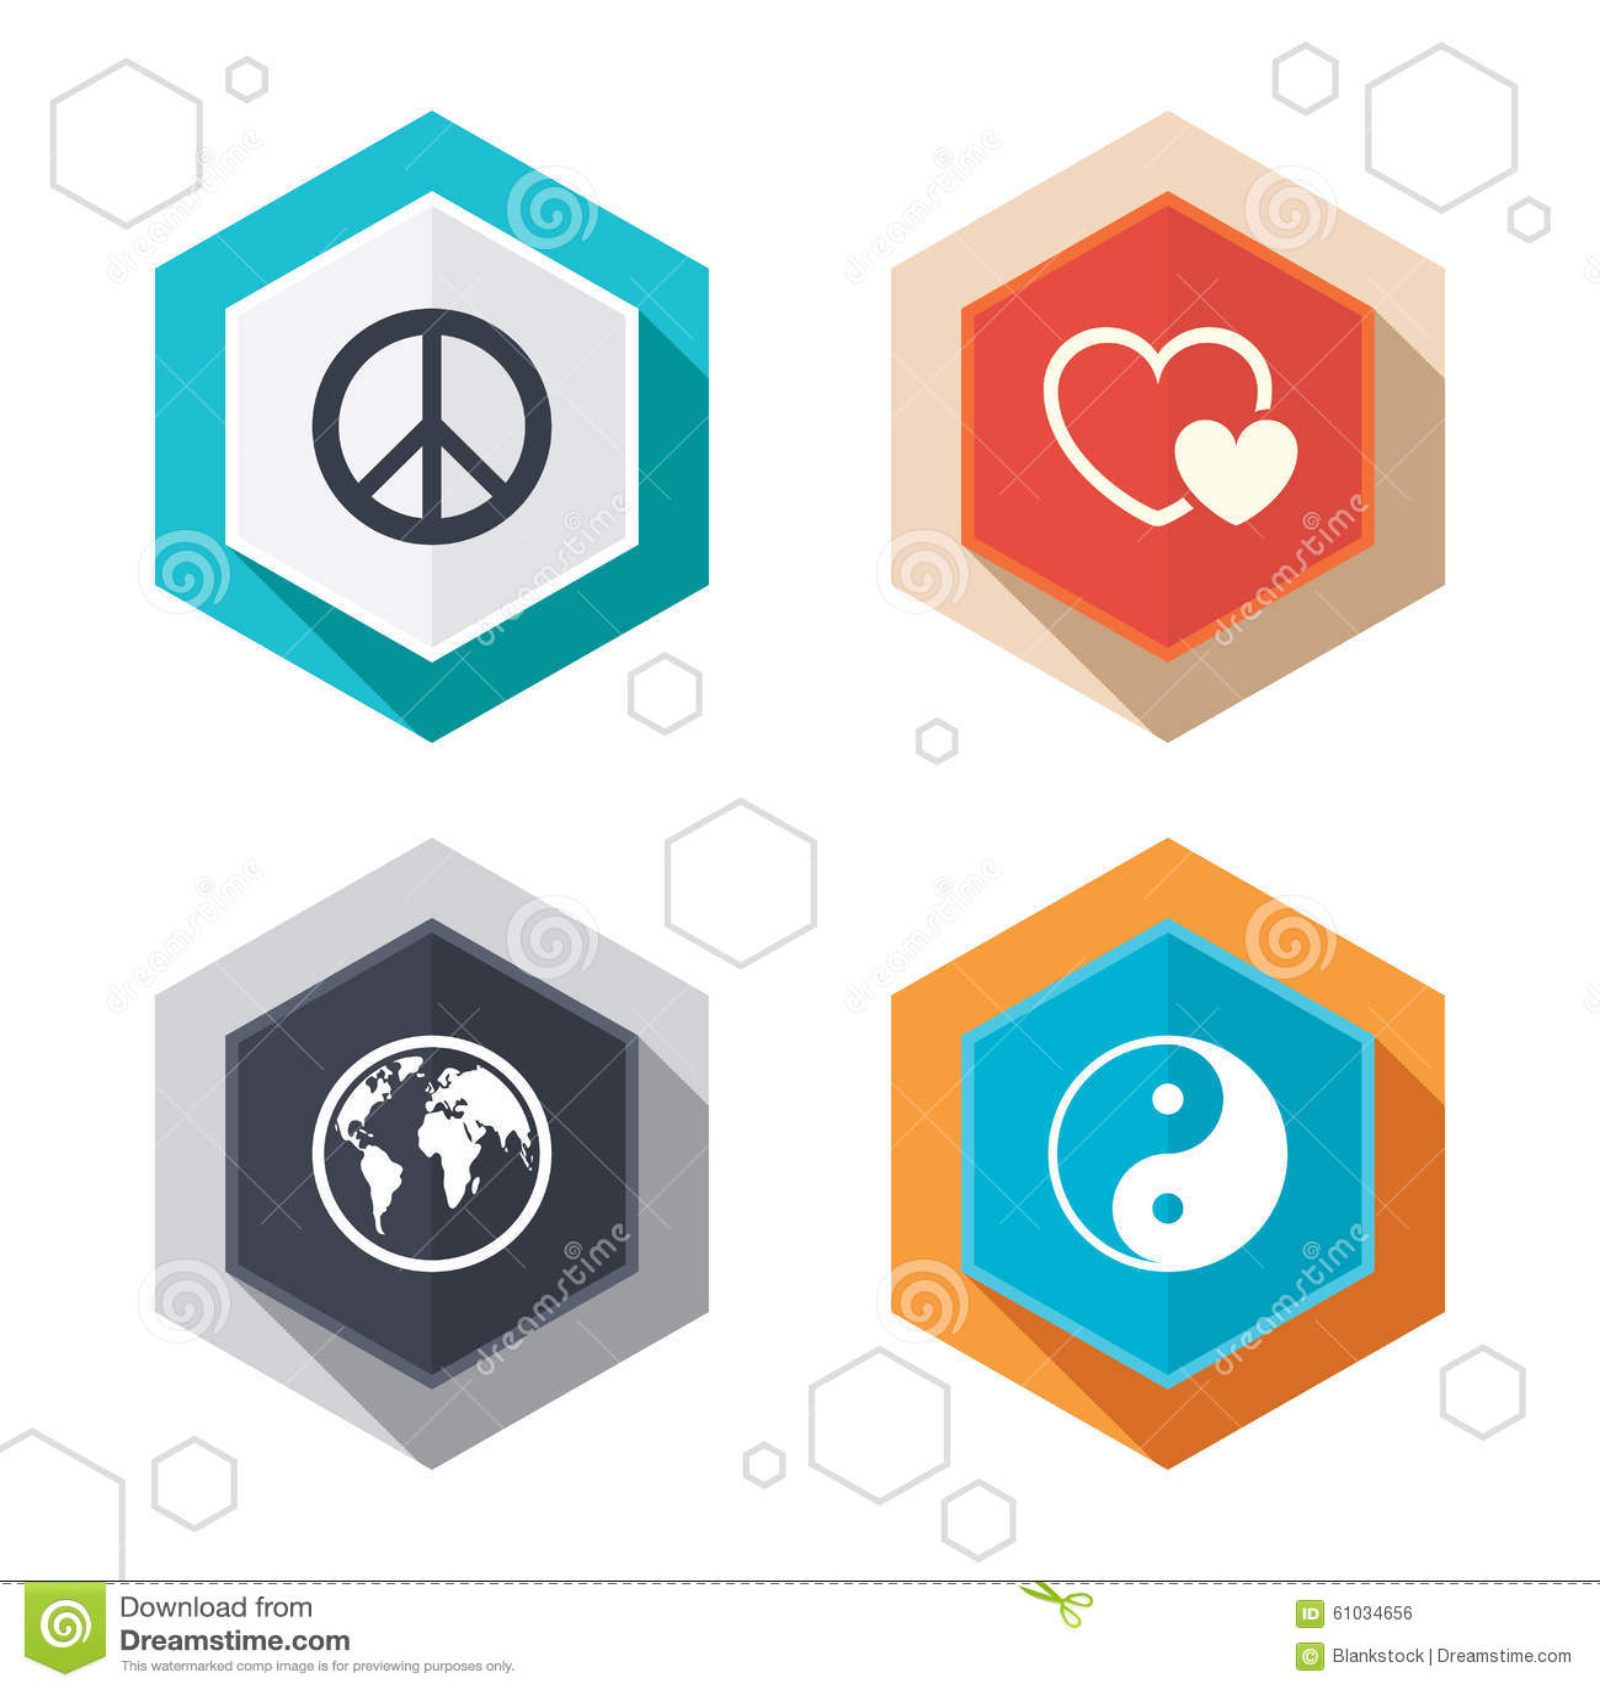 World globe icon. Ying yang sign. Hearts love